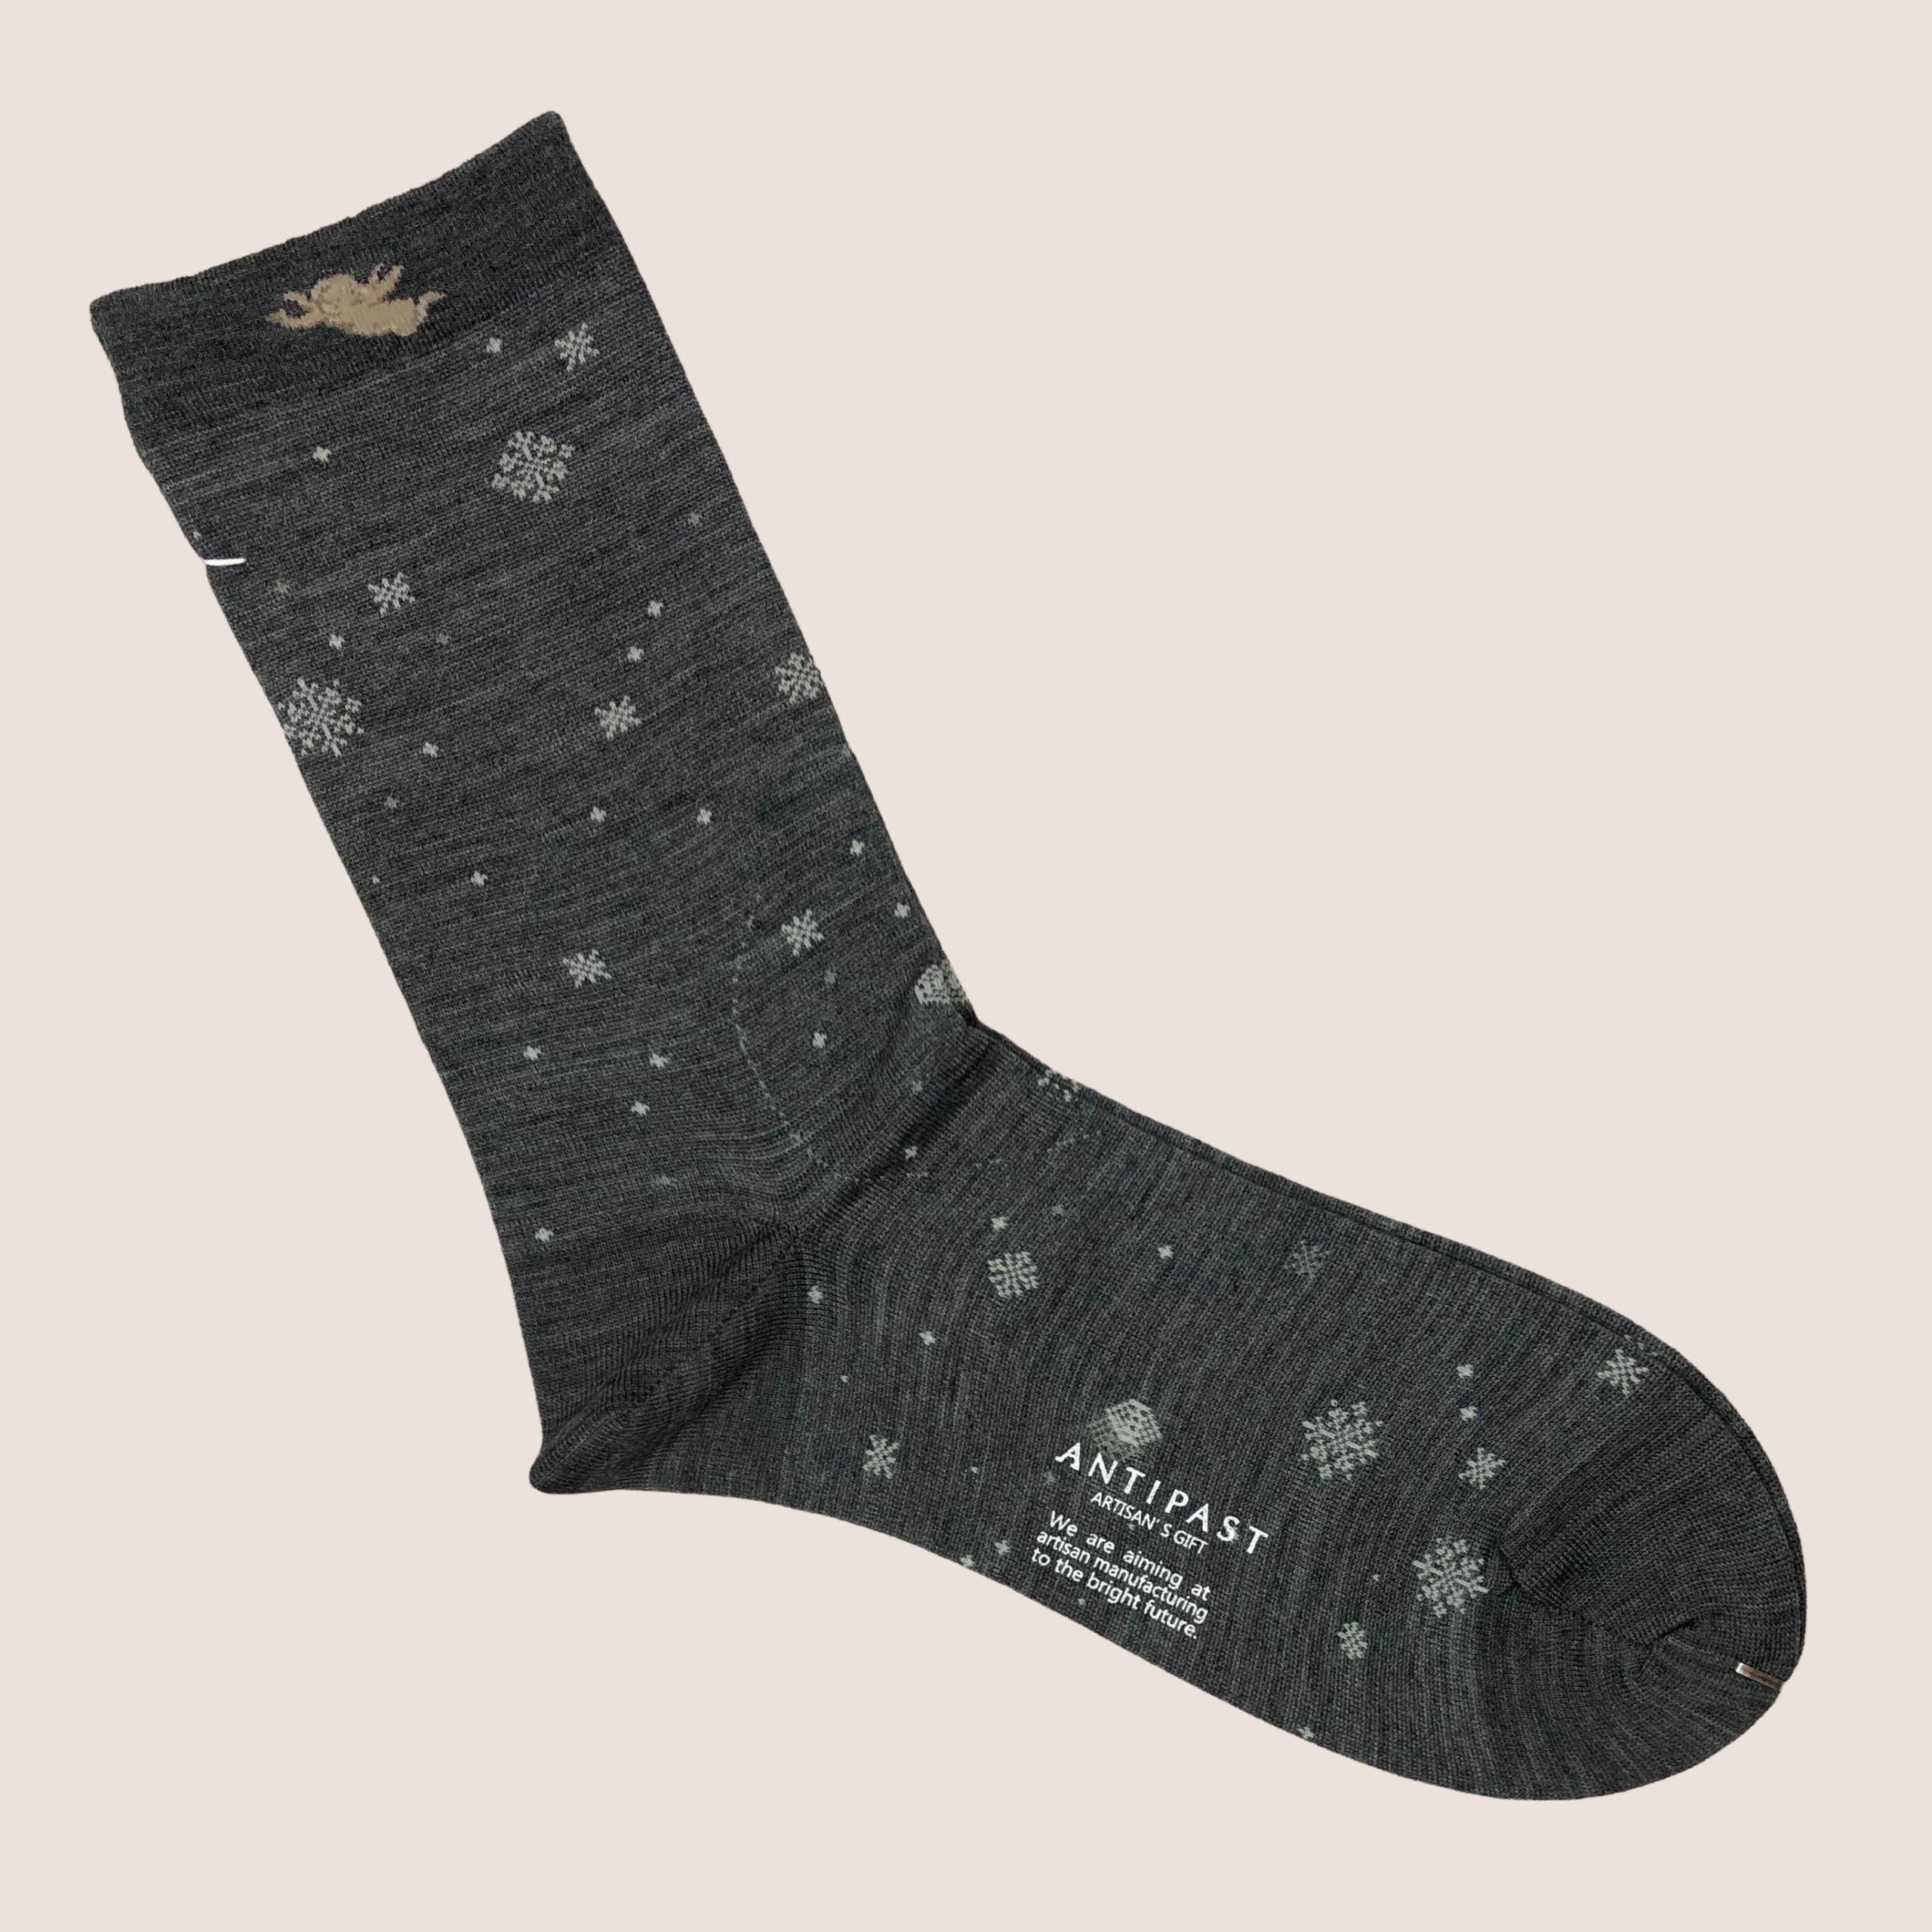 Socks KT-150S